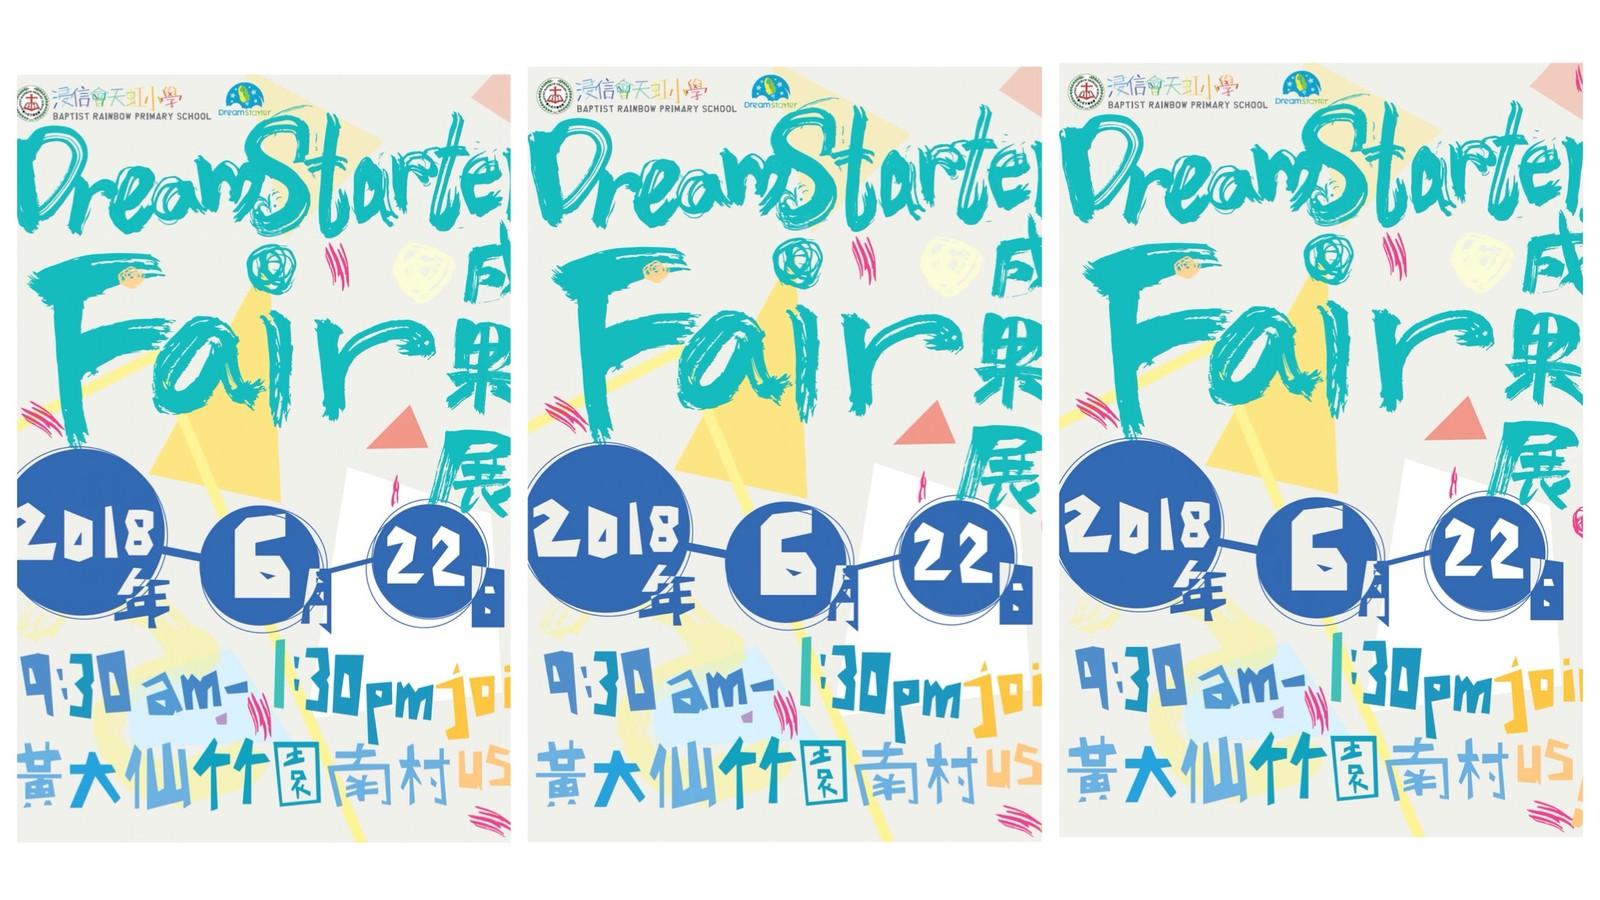 2018年6月22日 DreamStarter Fair 成果展